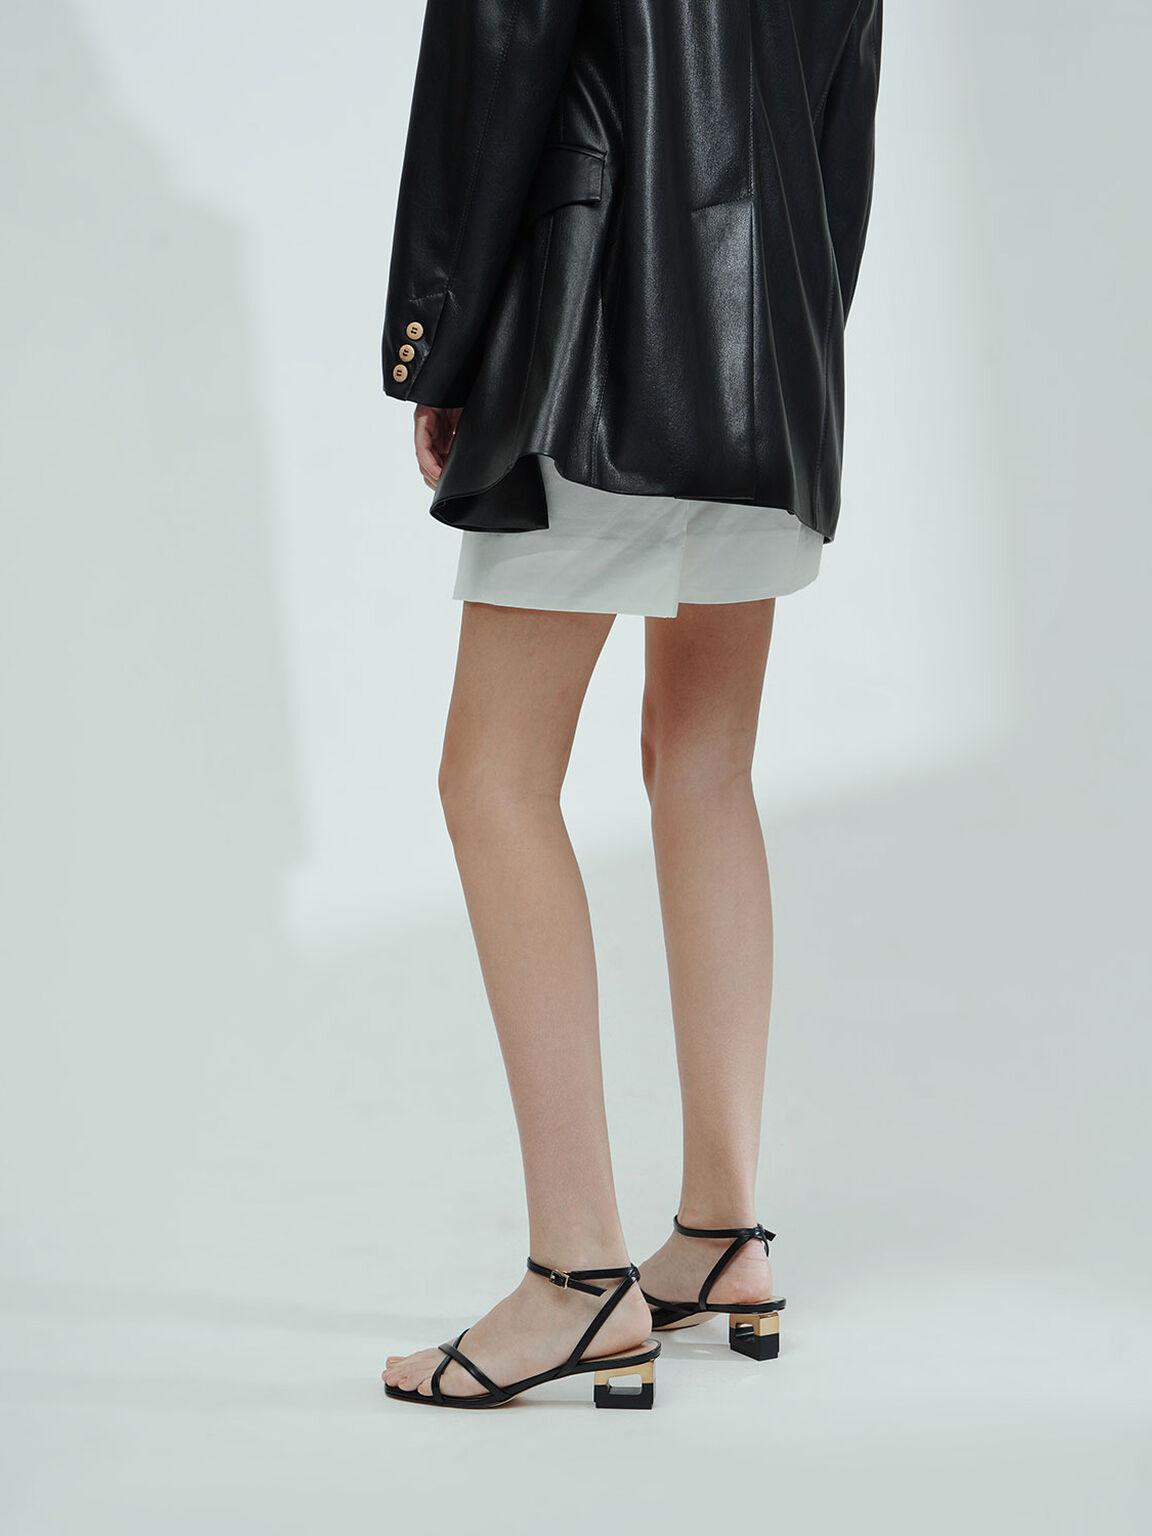 Sculptural Chrome Heel Sandals, Black, hi-res